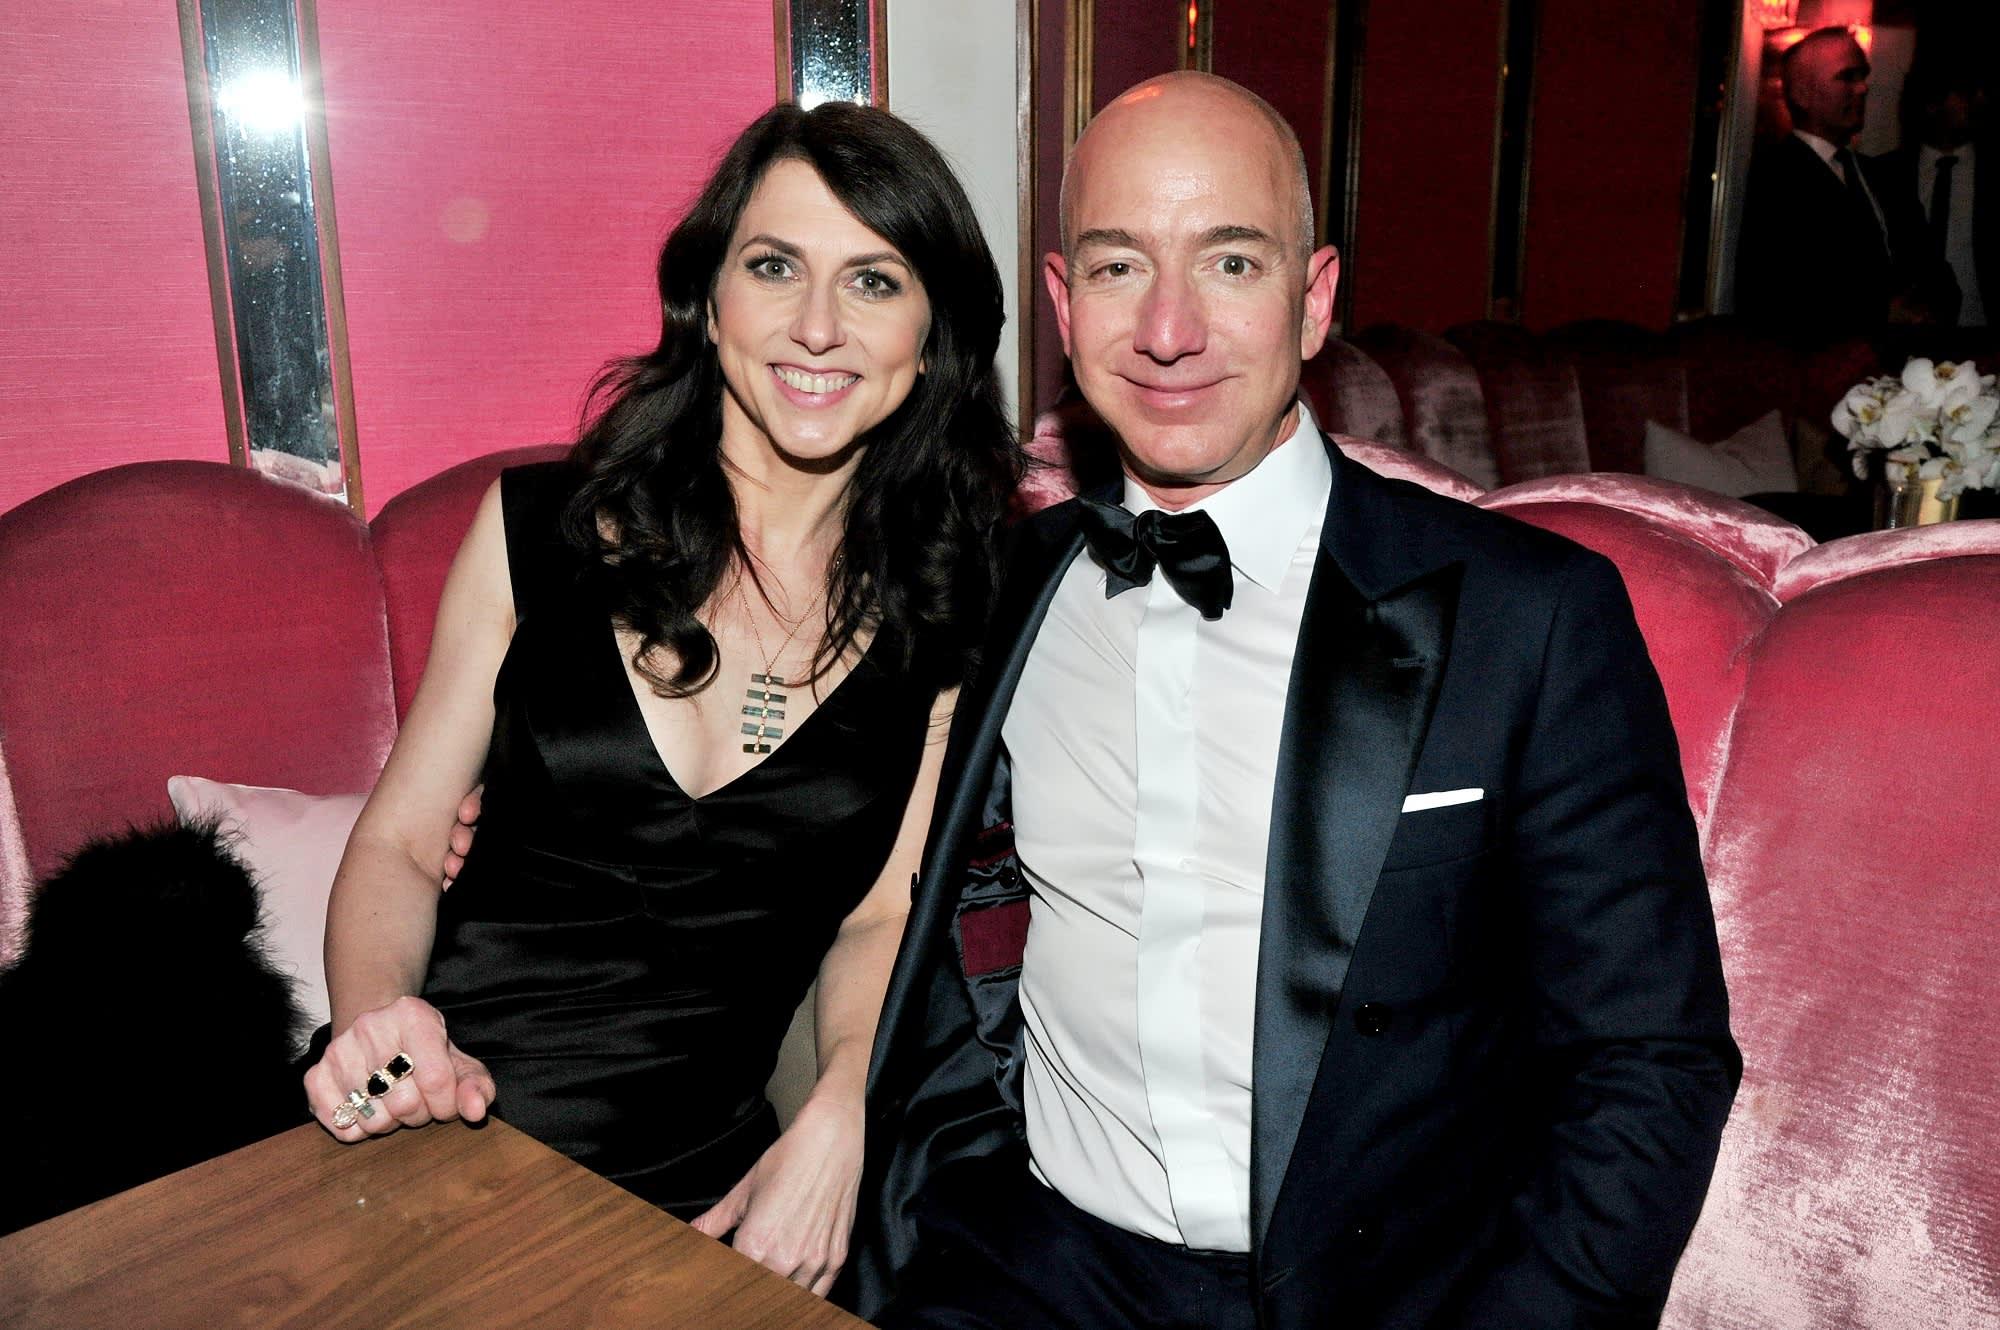 CEO of Amazon Jeff Bezos and writer MacKenzie Bezos attend the Amazon Studios Oscar Celebration at Delilah on February 26, 2017 in West Hollywood, California.